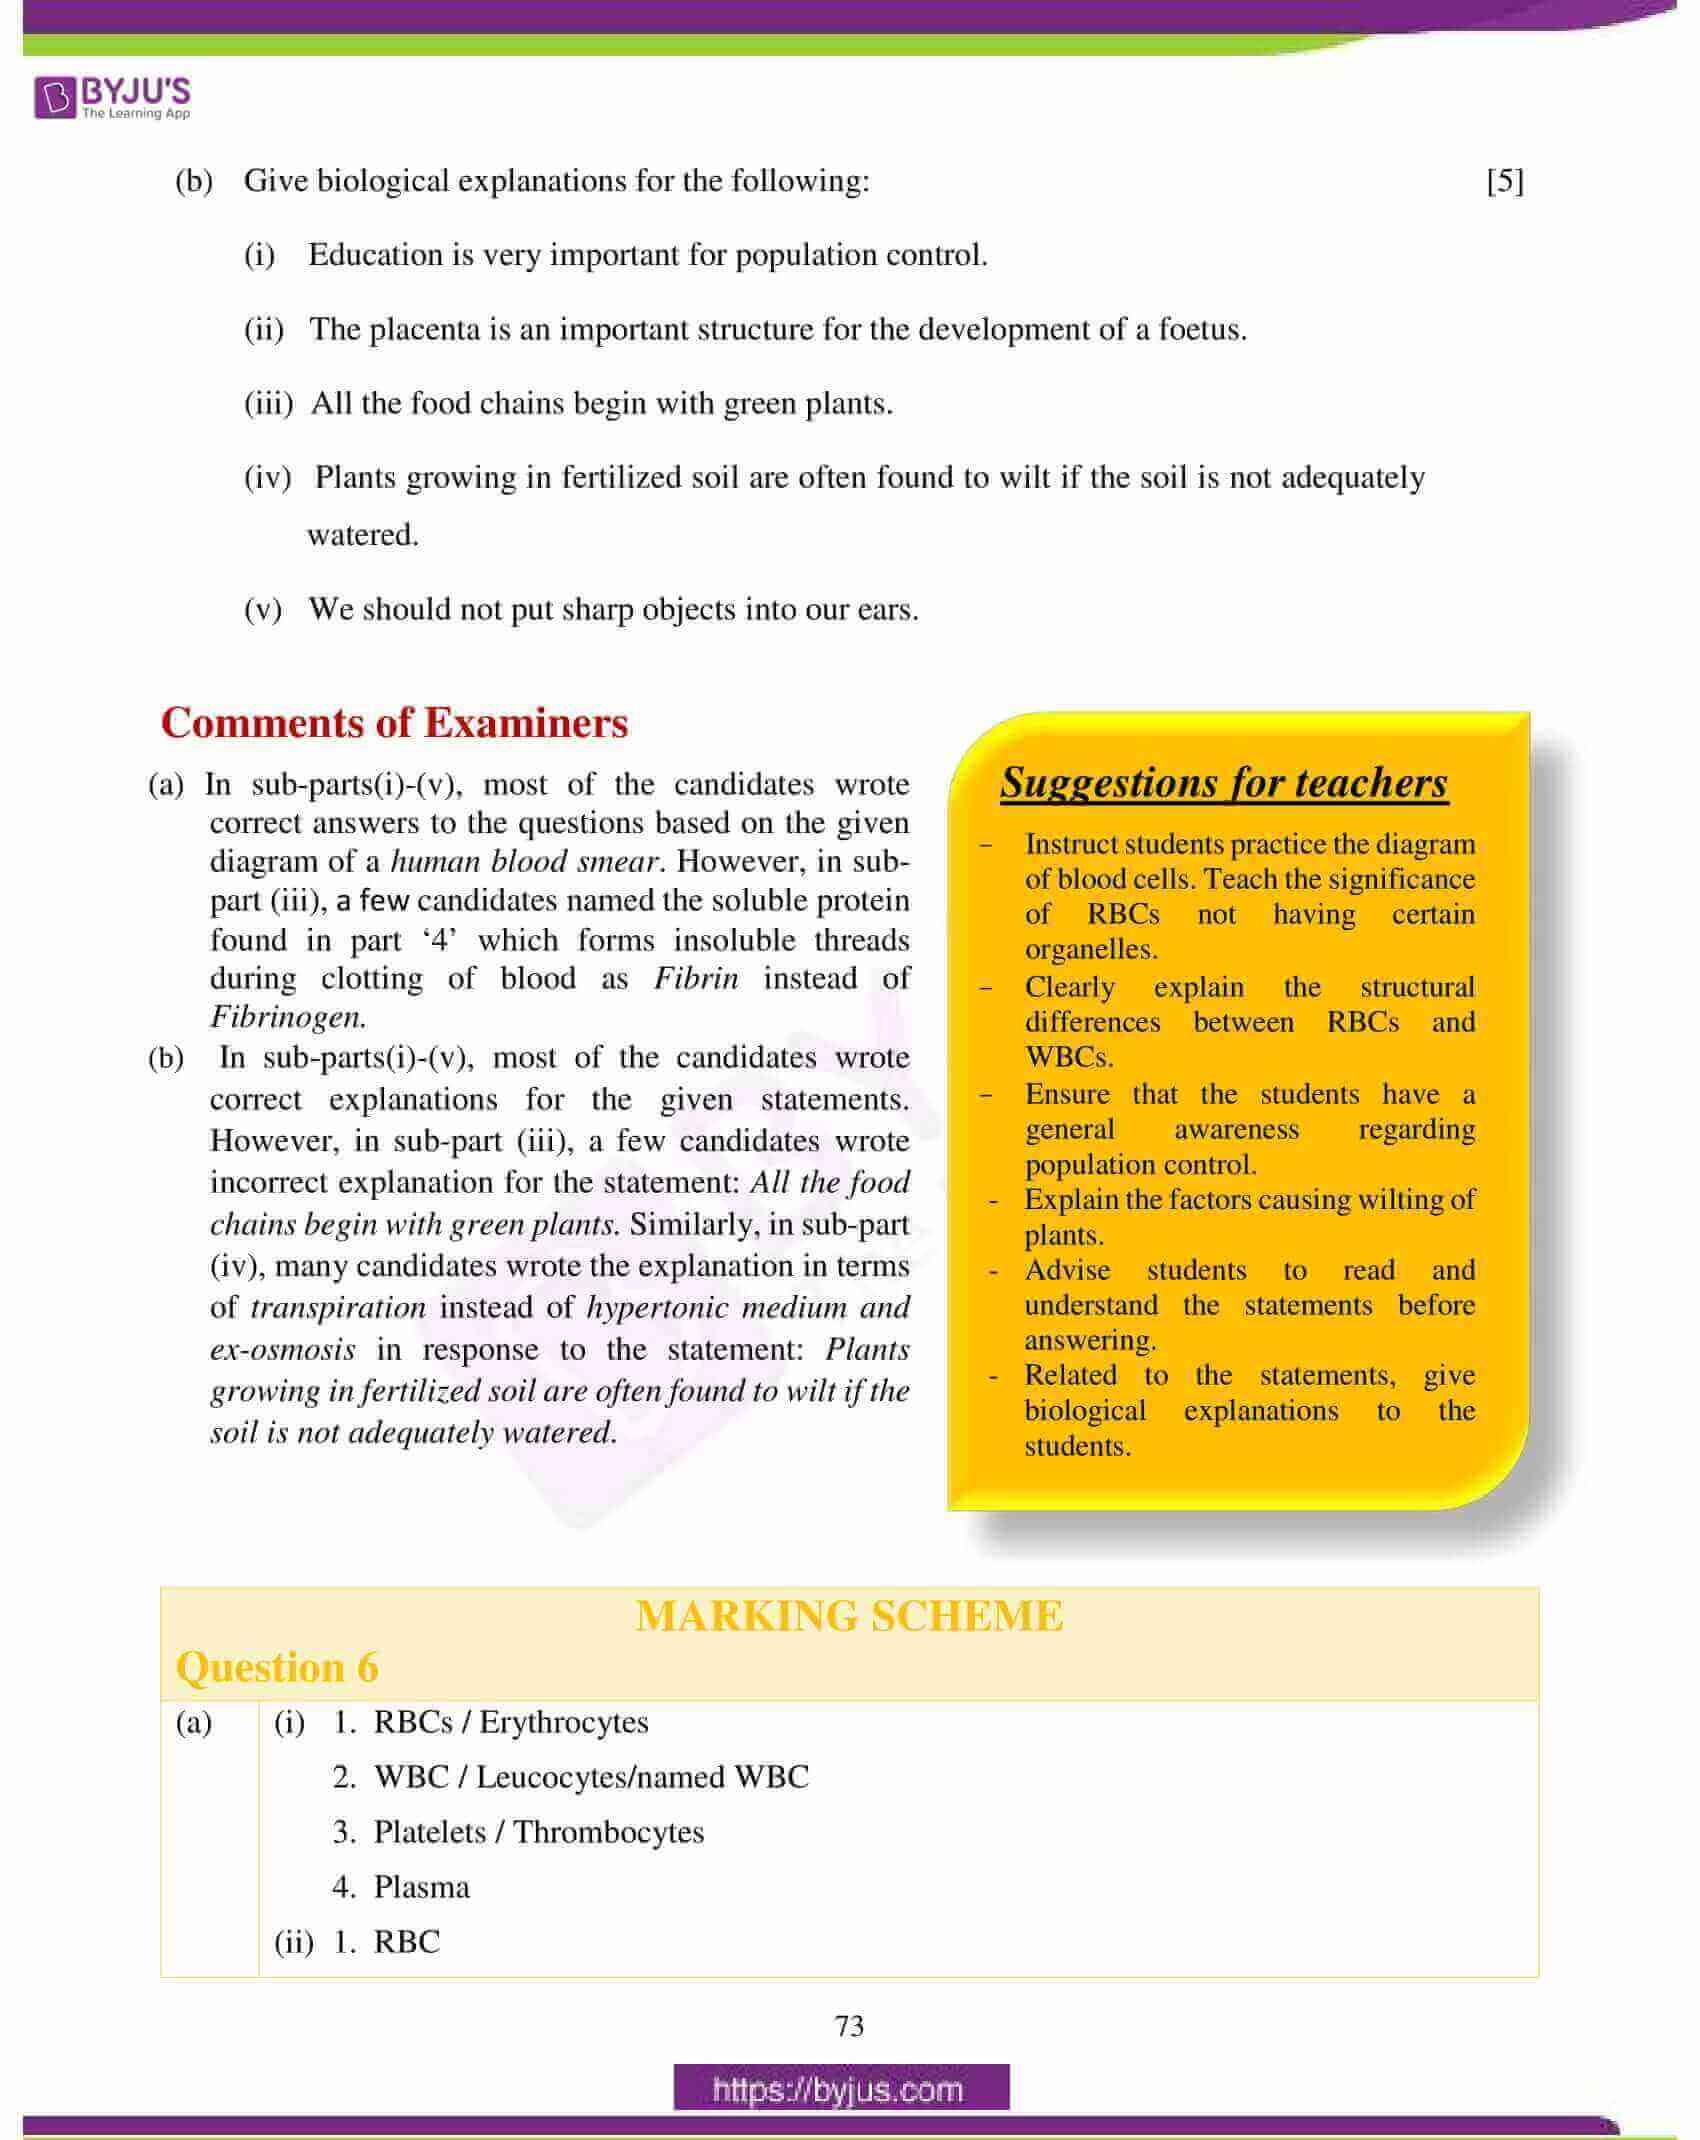 icse class 10 biology question paper solution 2018 20